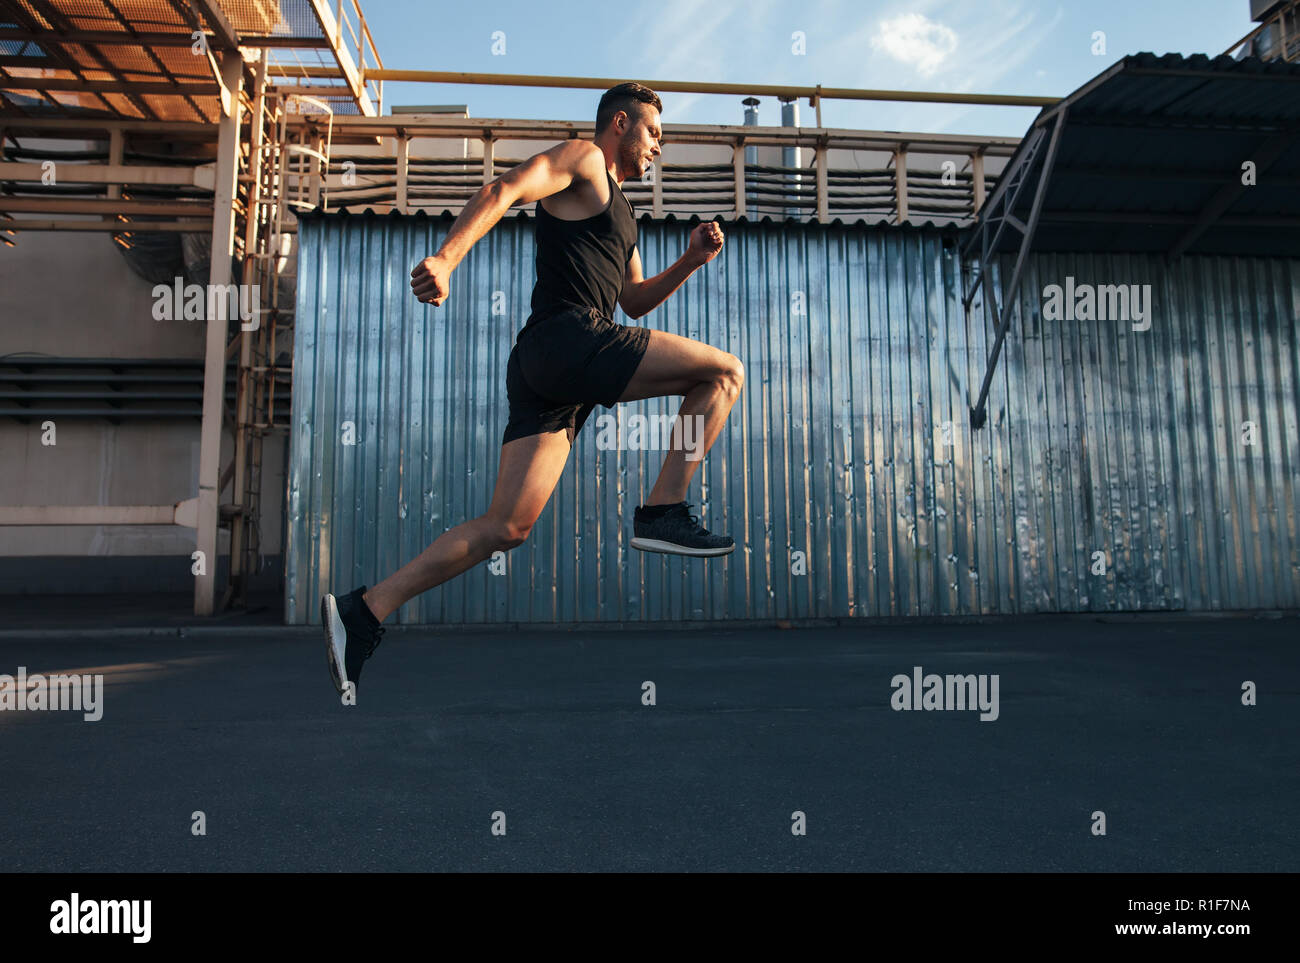 Hübscher junger Mann in ndustrial Gebäude Hintergrund. Läufer, Jogger, Fitness Stockbild